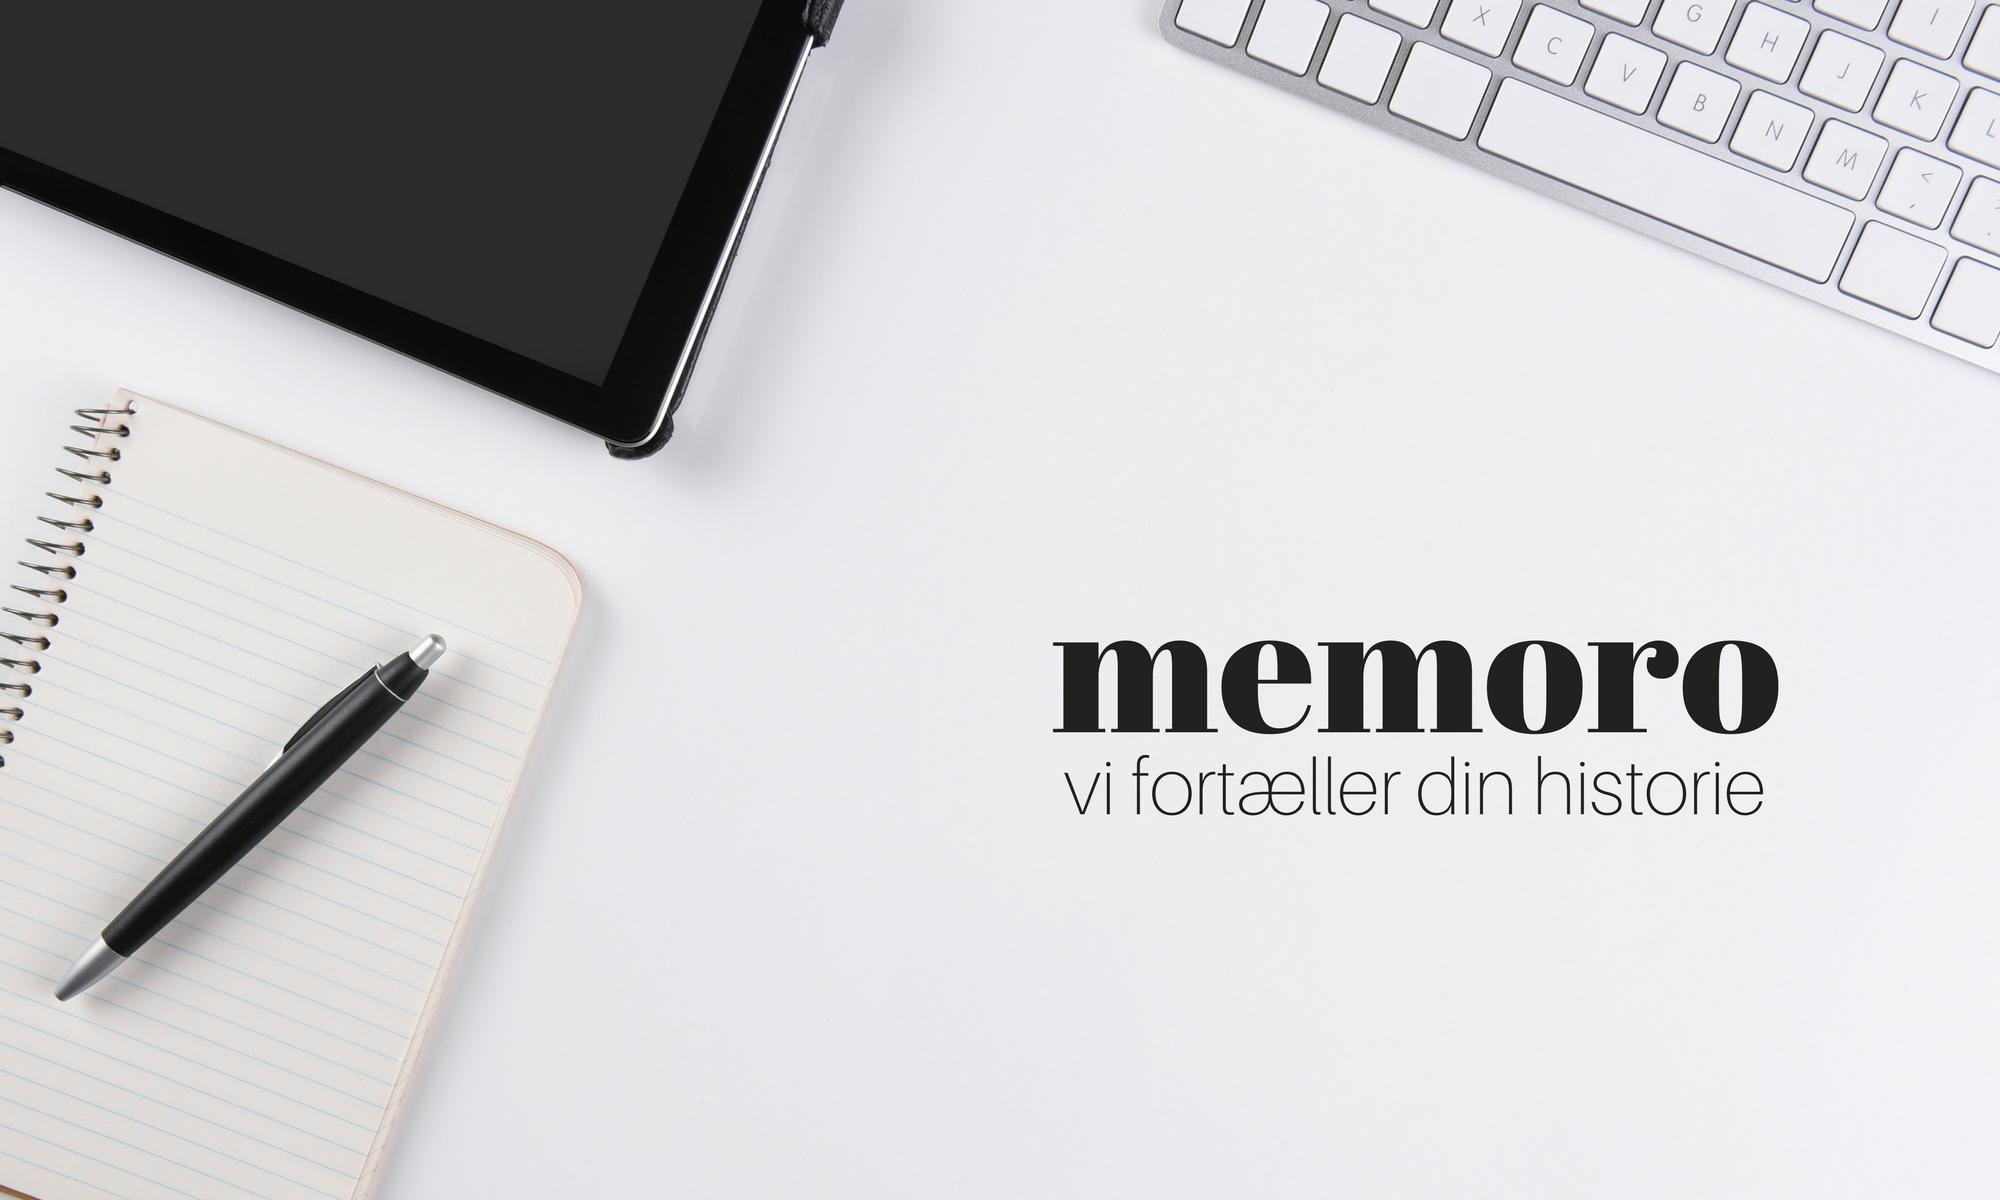 MEMORO